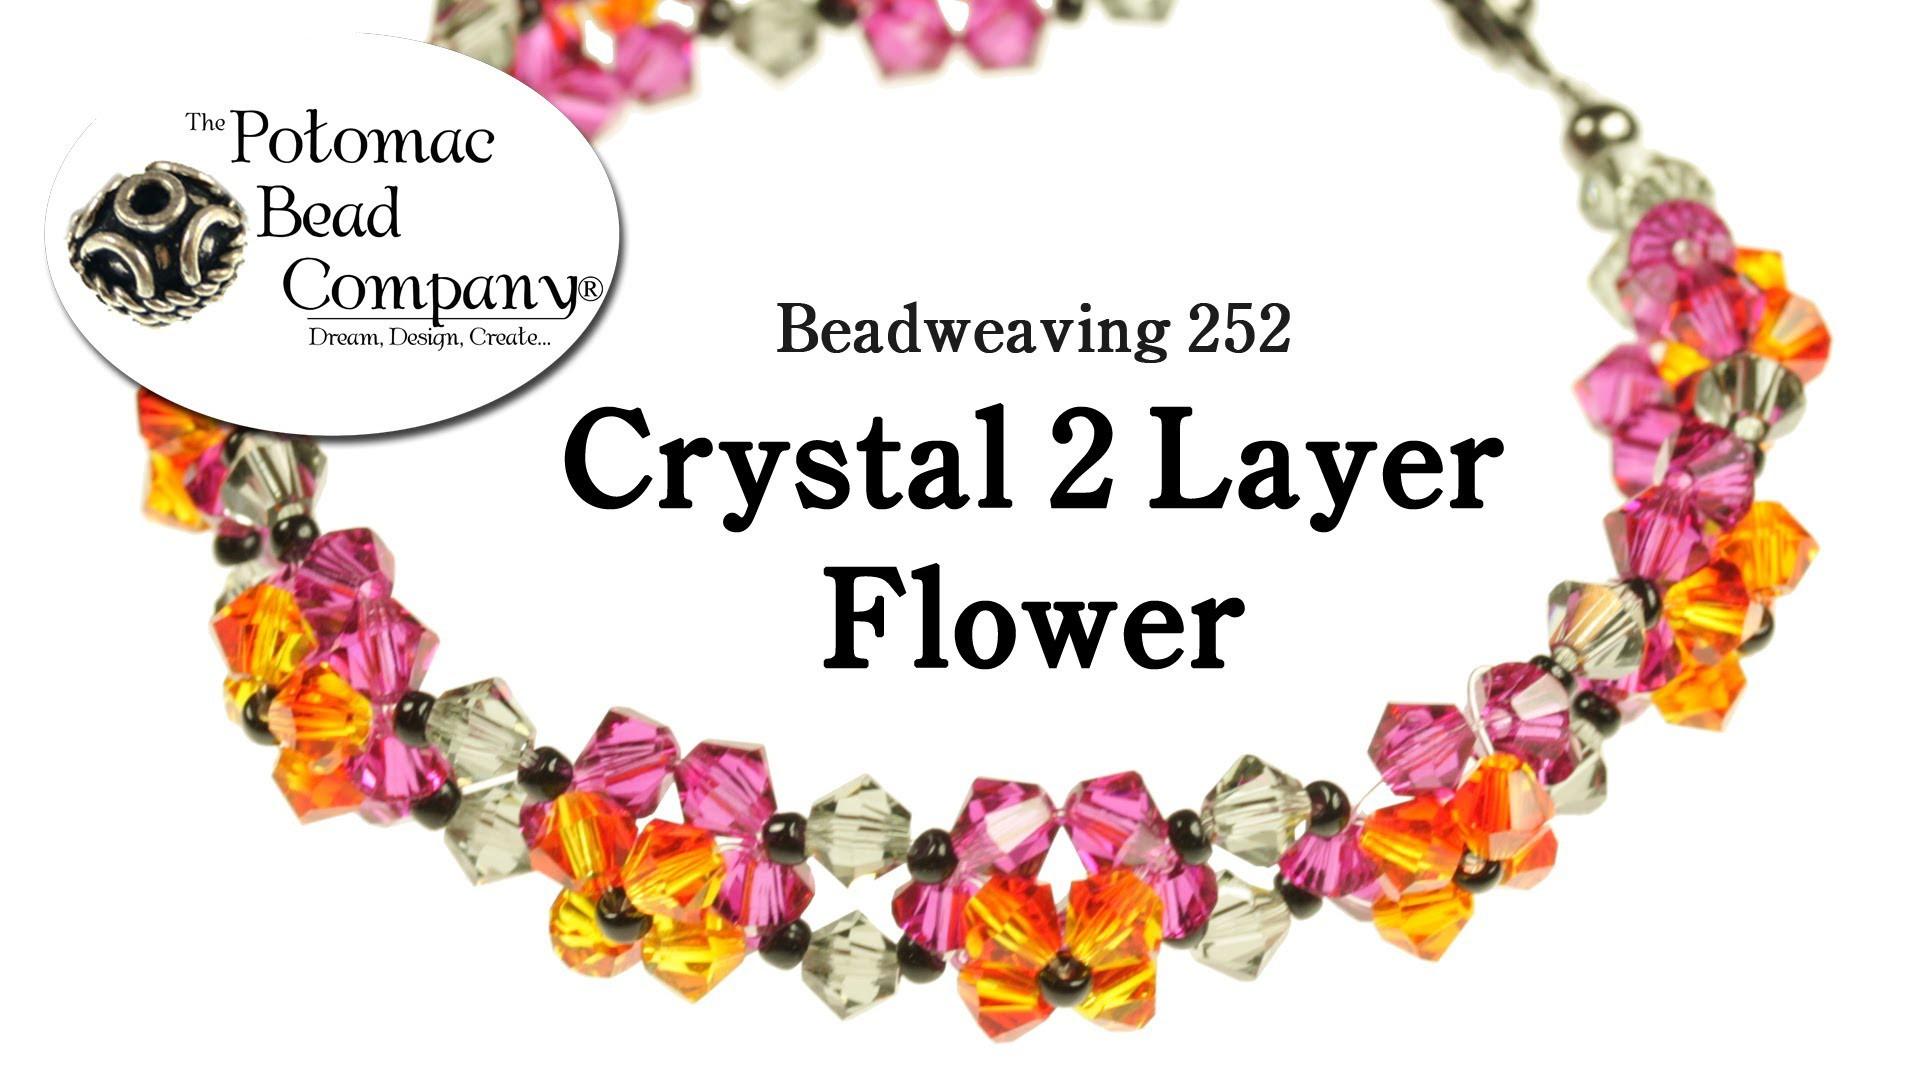 Crystal 2 Layer Flower Bracelet (Reversible) - Beadweaving 252